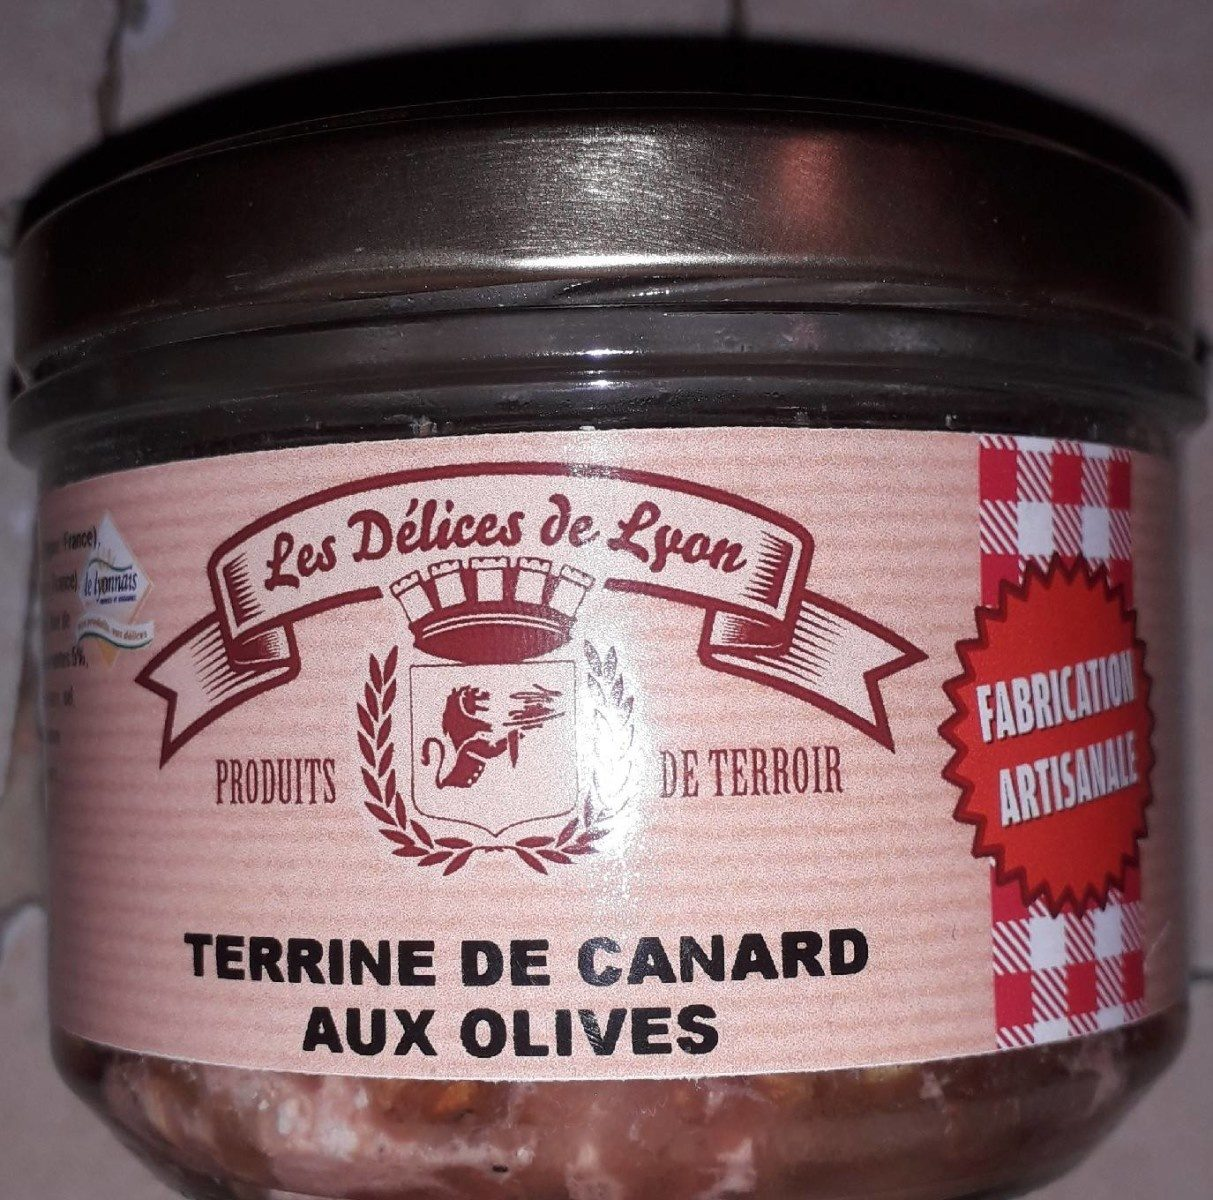 Terrine de canard aux olives - Product